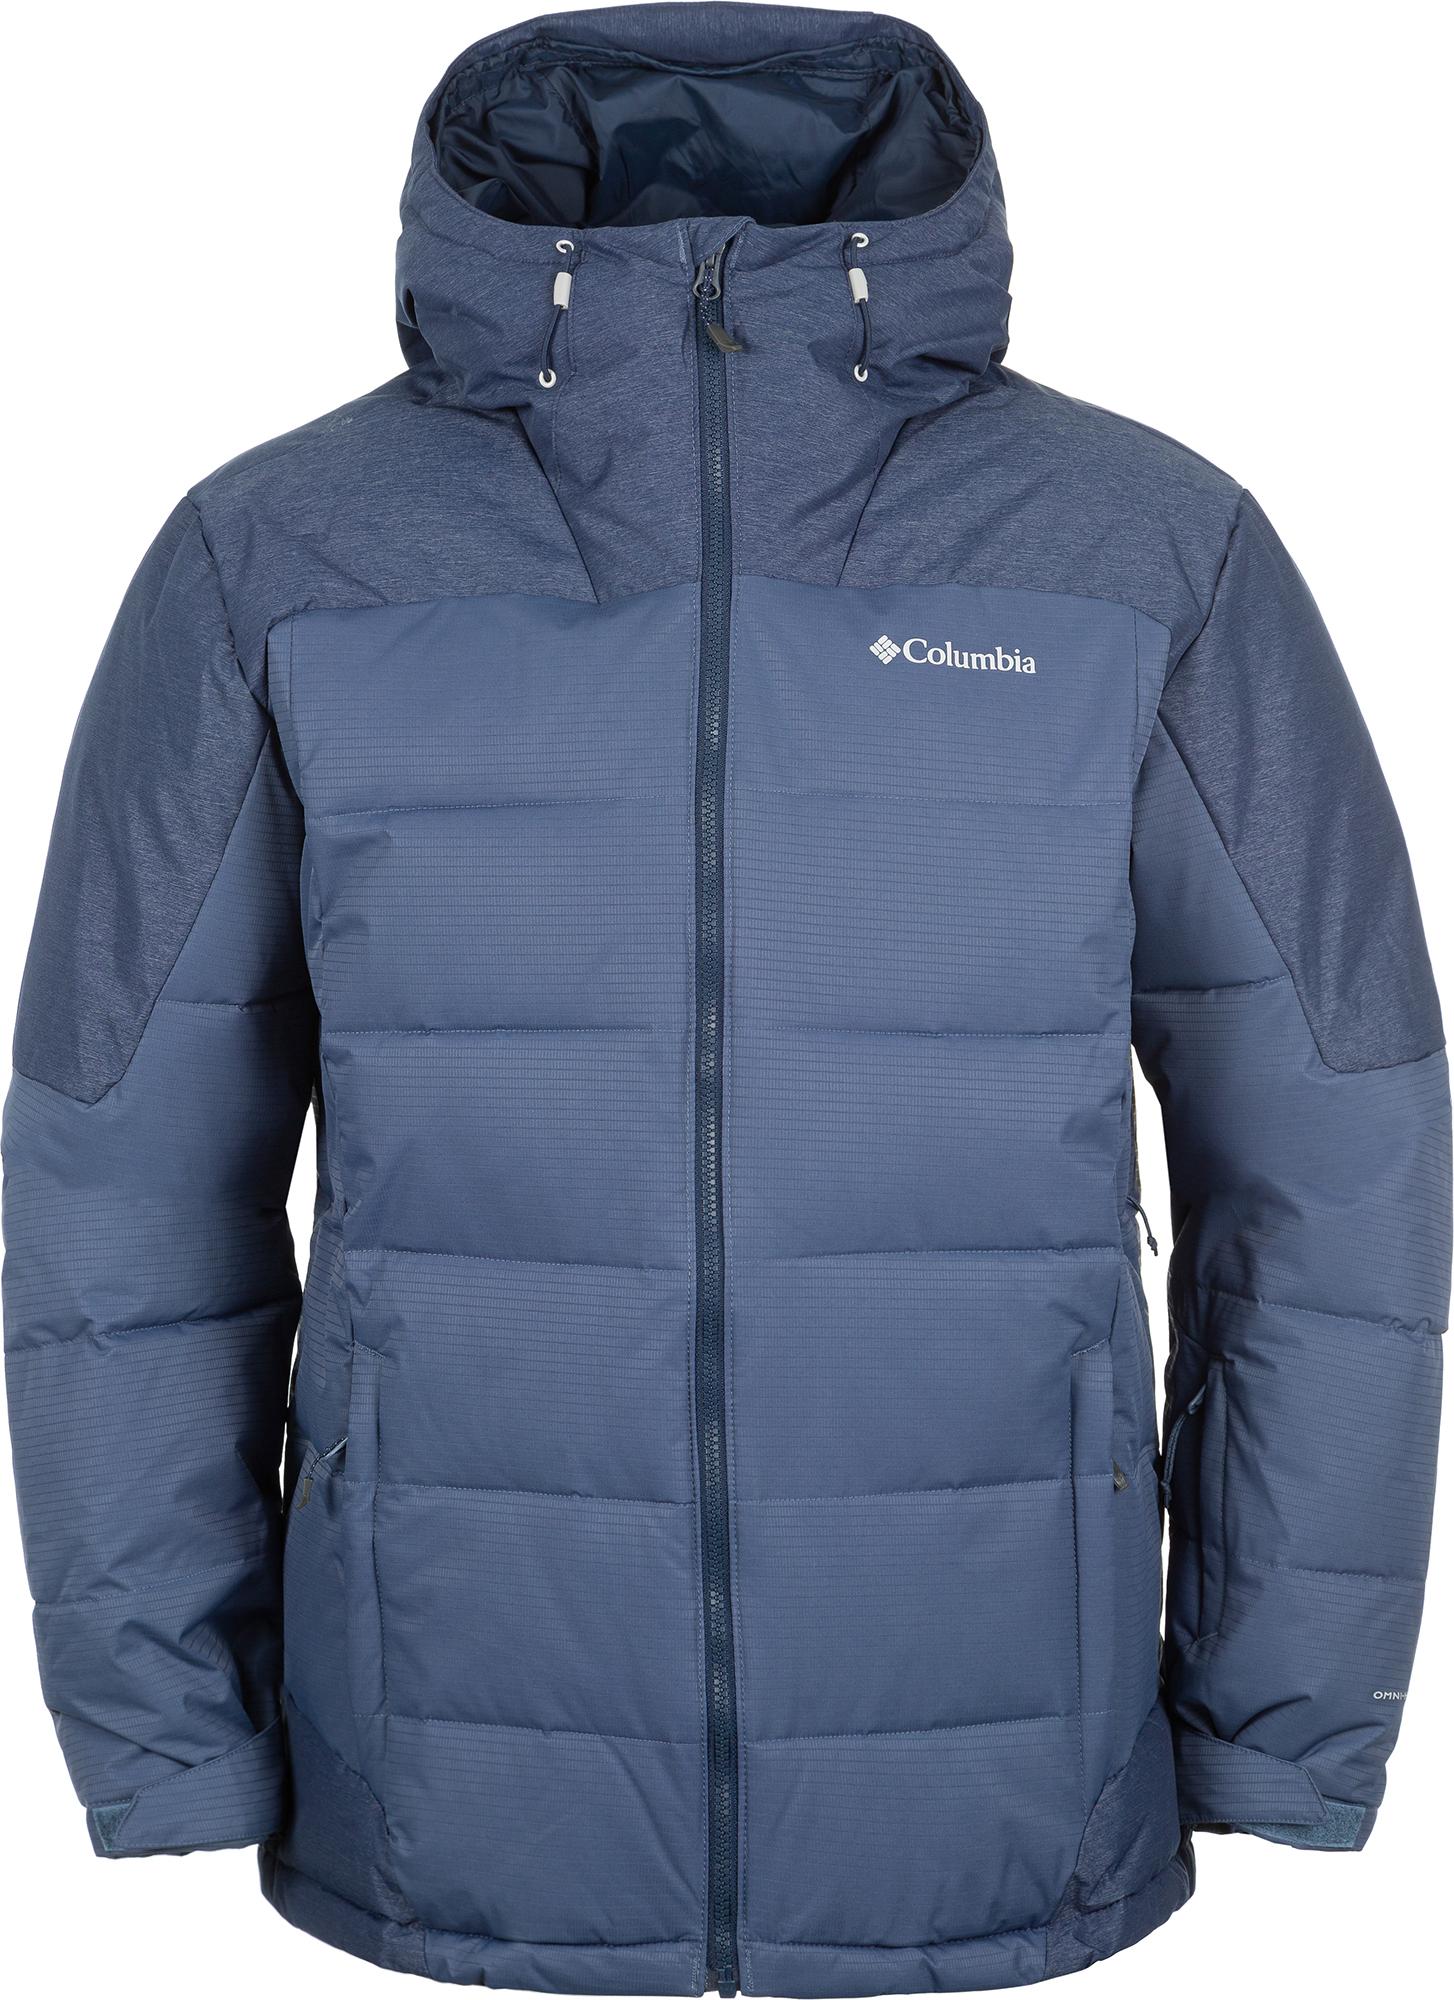 Columbia Куртка утепленная мужская Columbia Woolly Hollow II, размер 52-54 цена